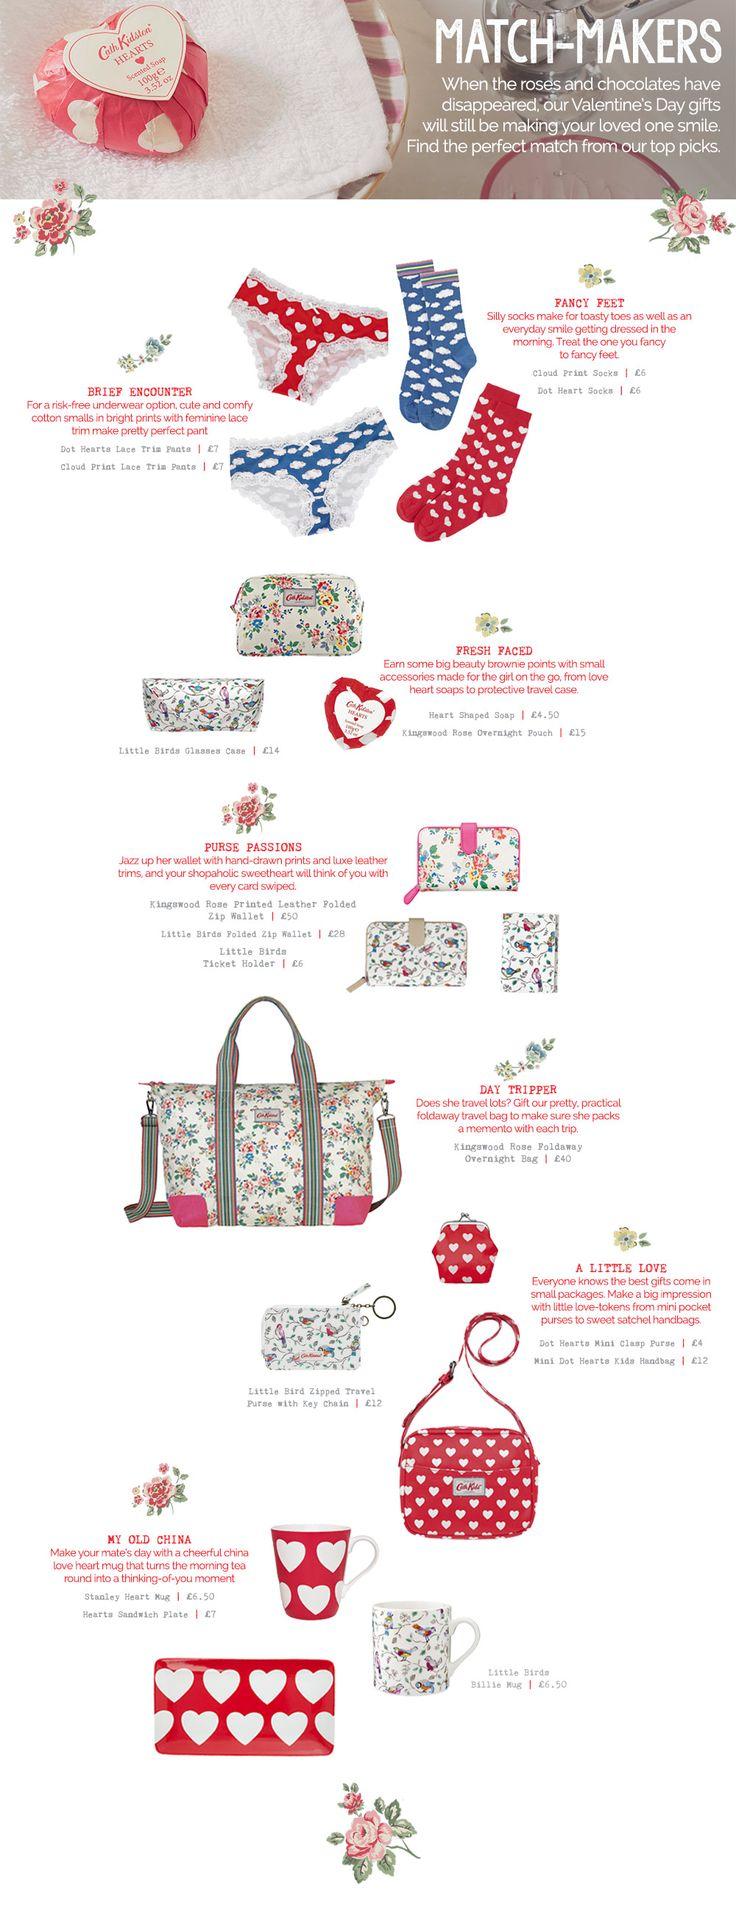 https://www.cathkidston.com/fcs/content/ss15/valentines-gift-finder/